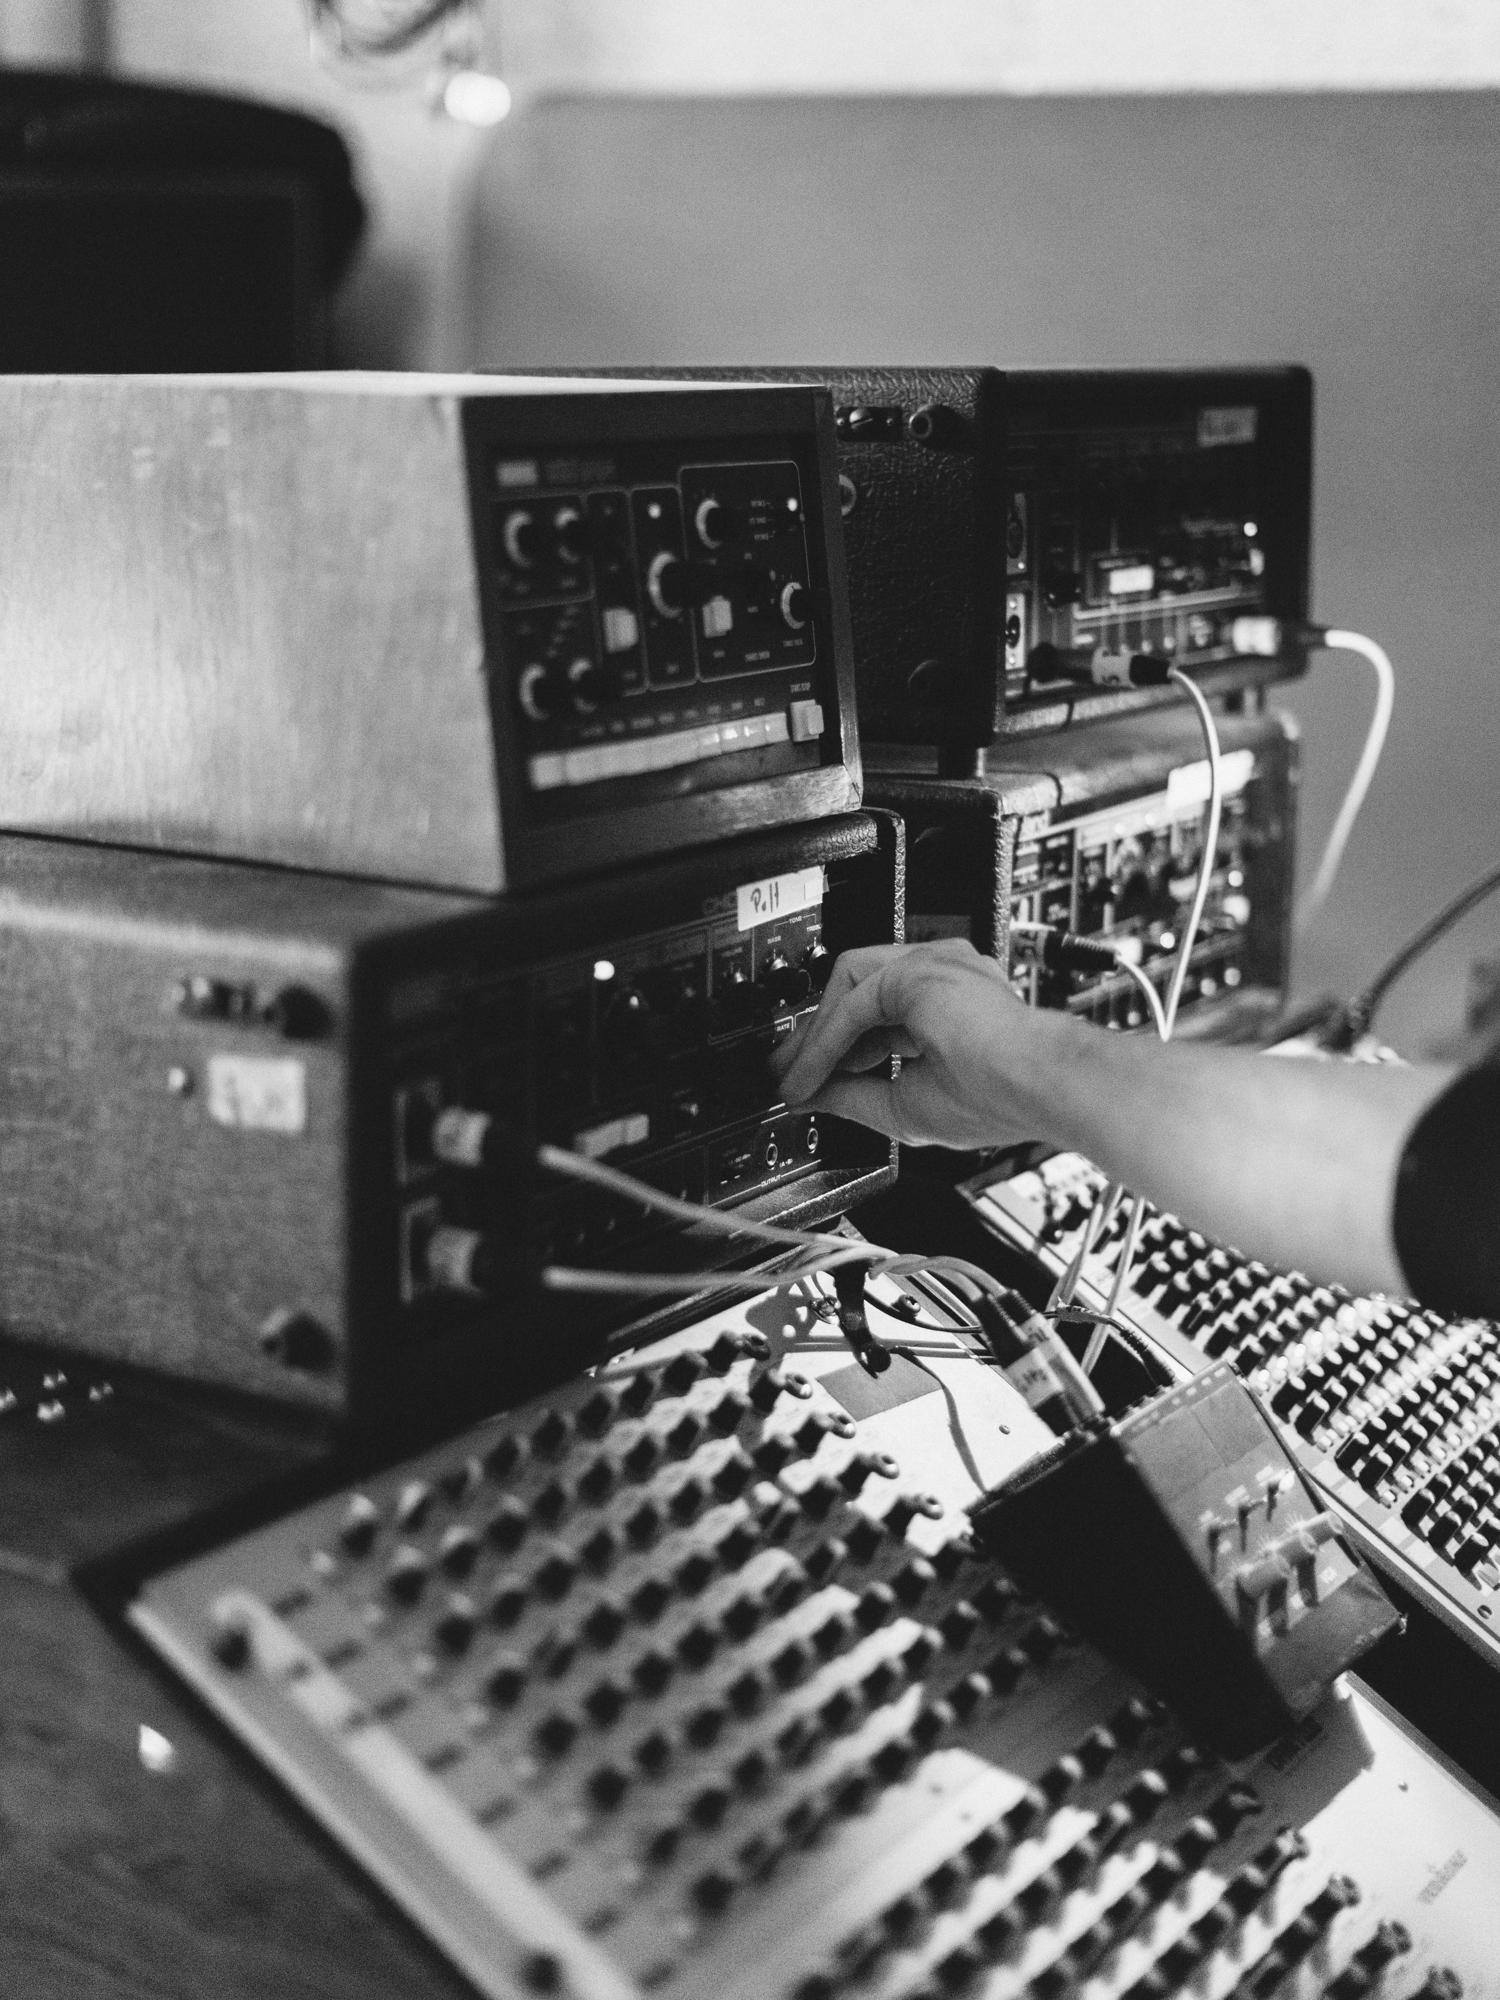 Composer Nils Frahm in his rehearsal studio in Berlin.